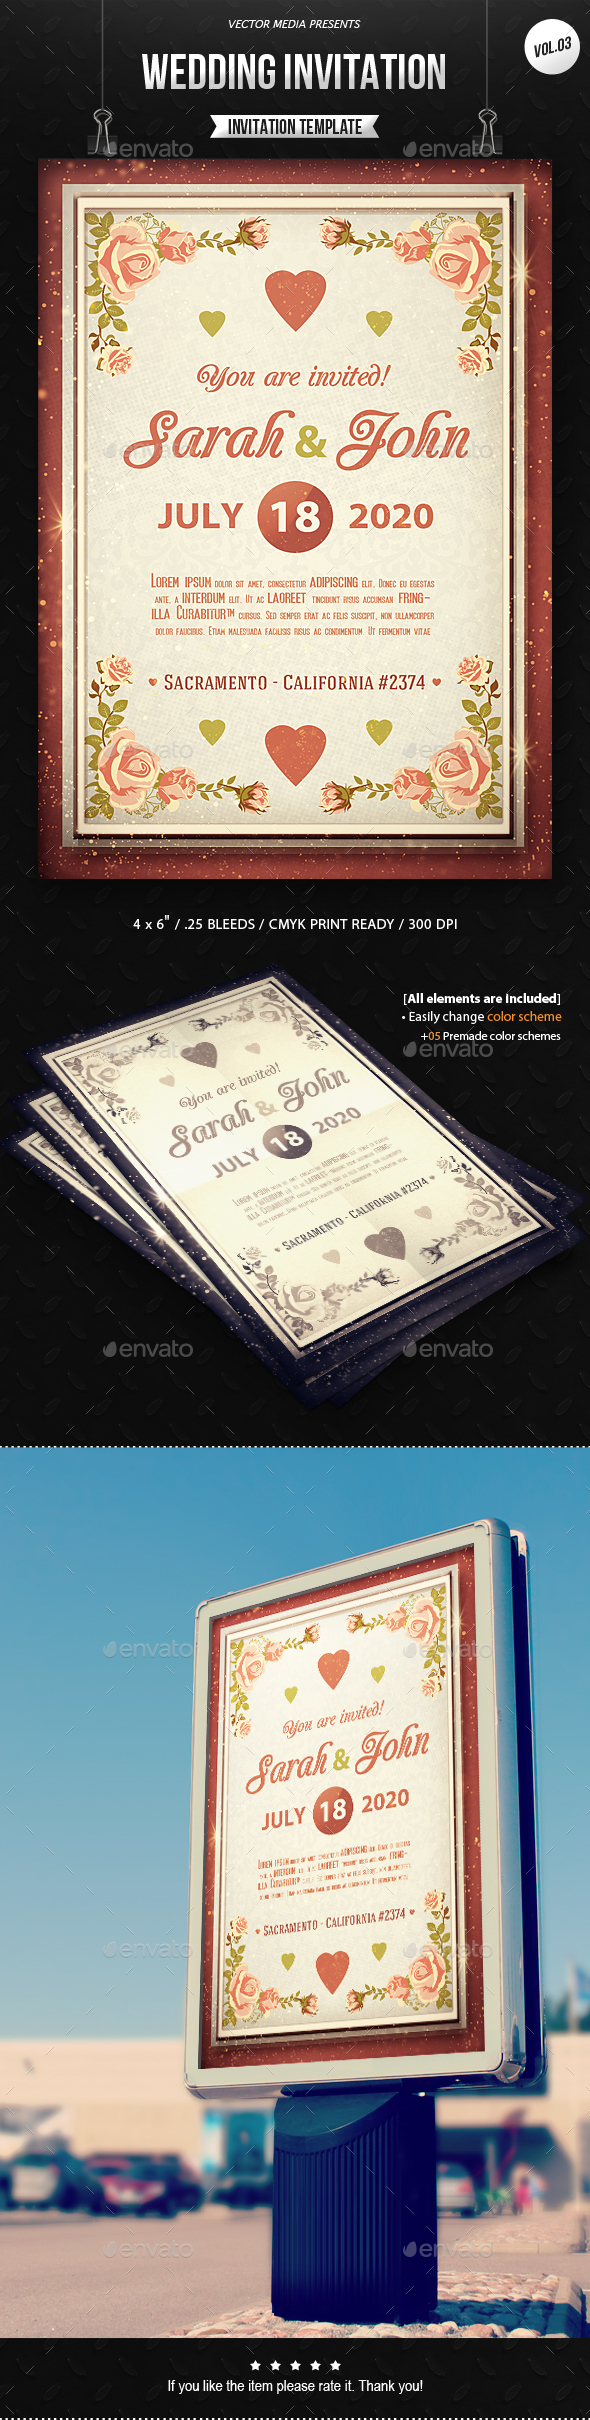 Wedding Invitation [Vol.3] - Weddings Cards & Invites